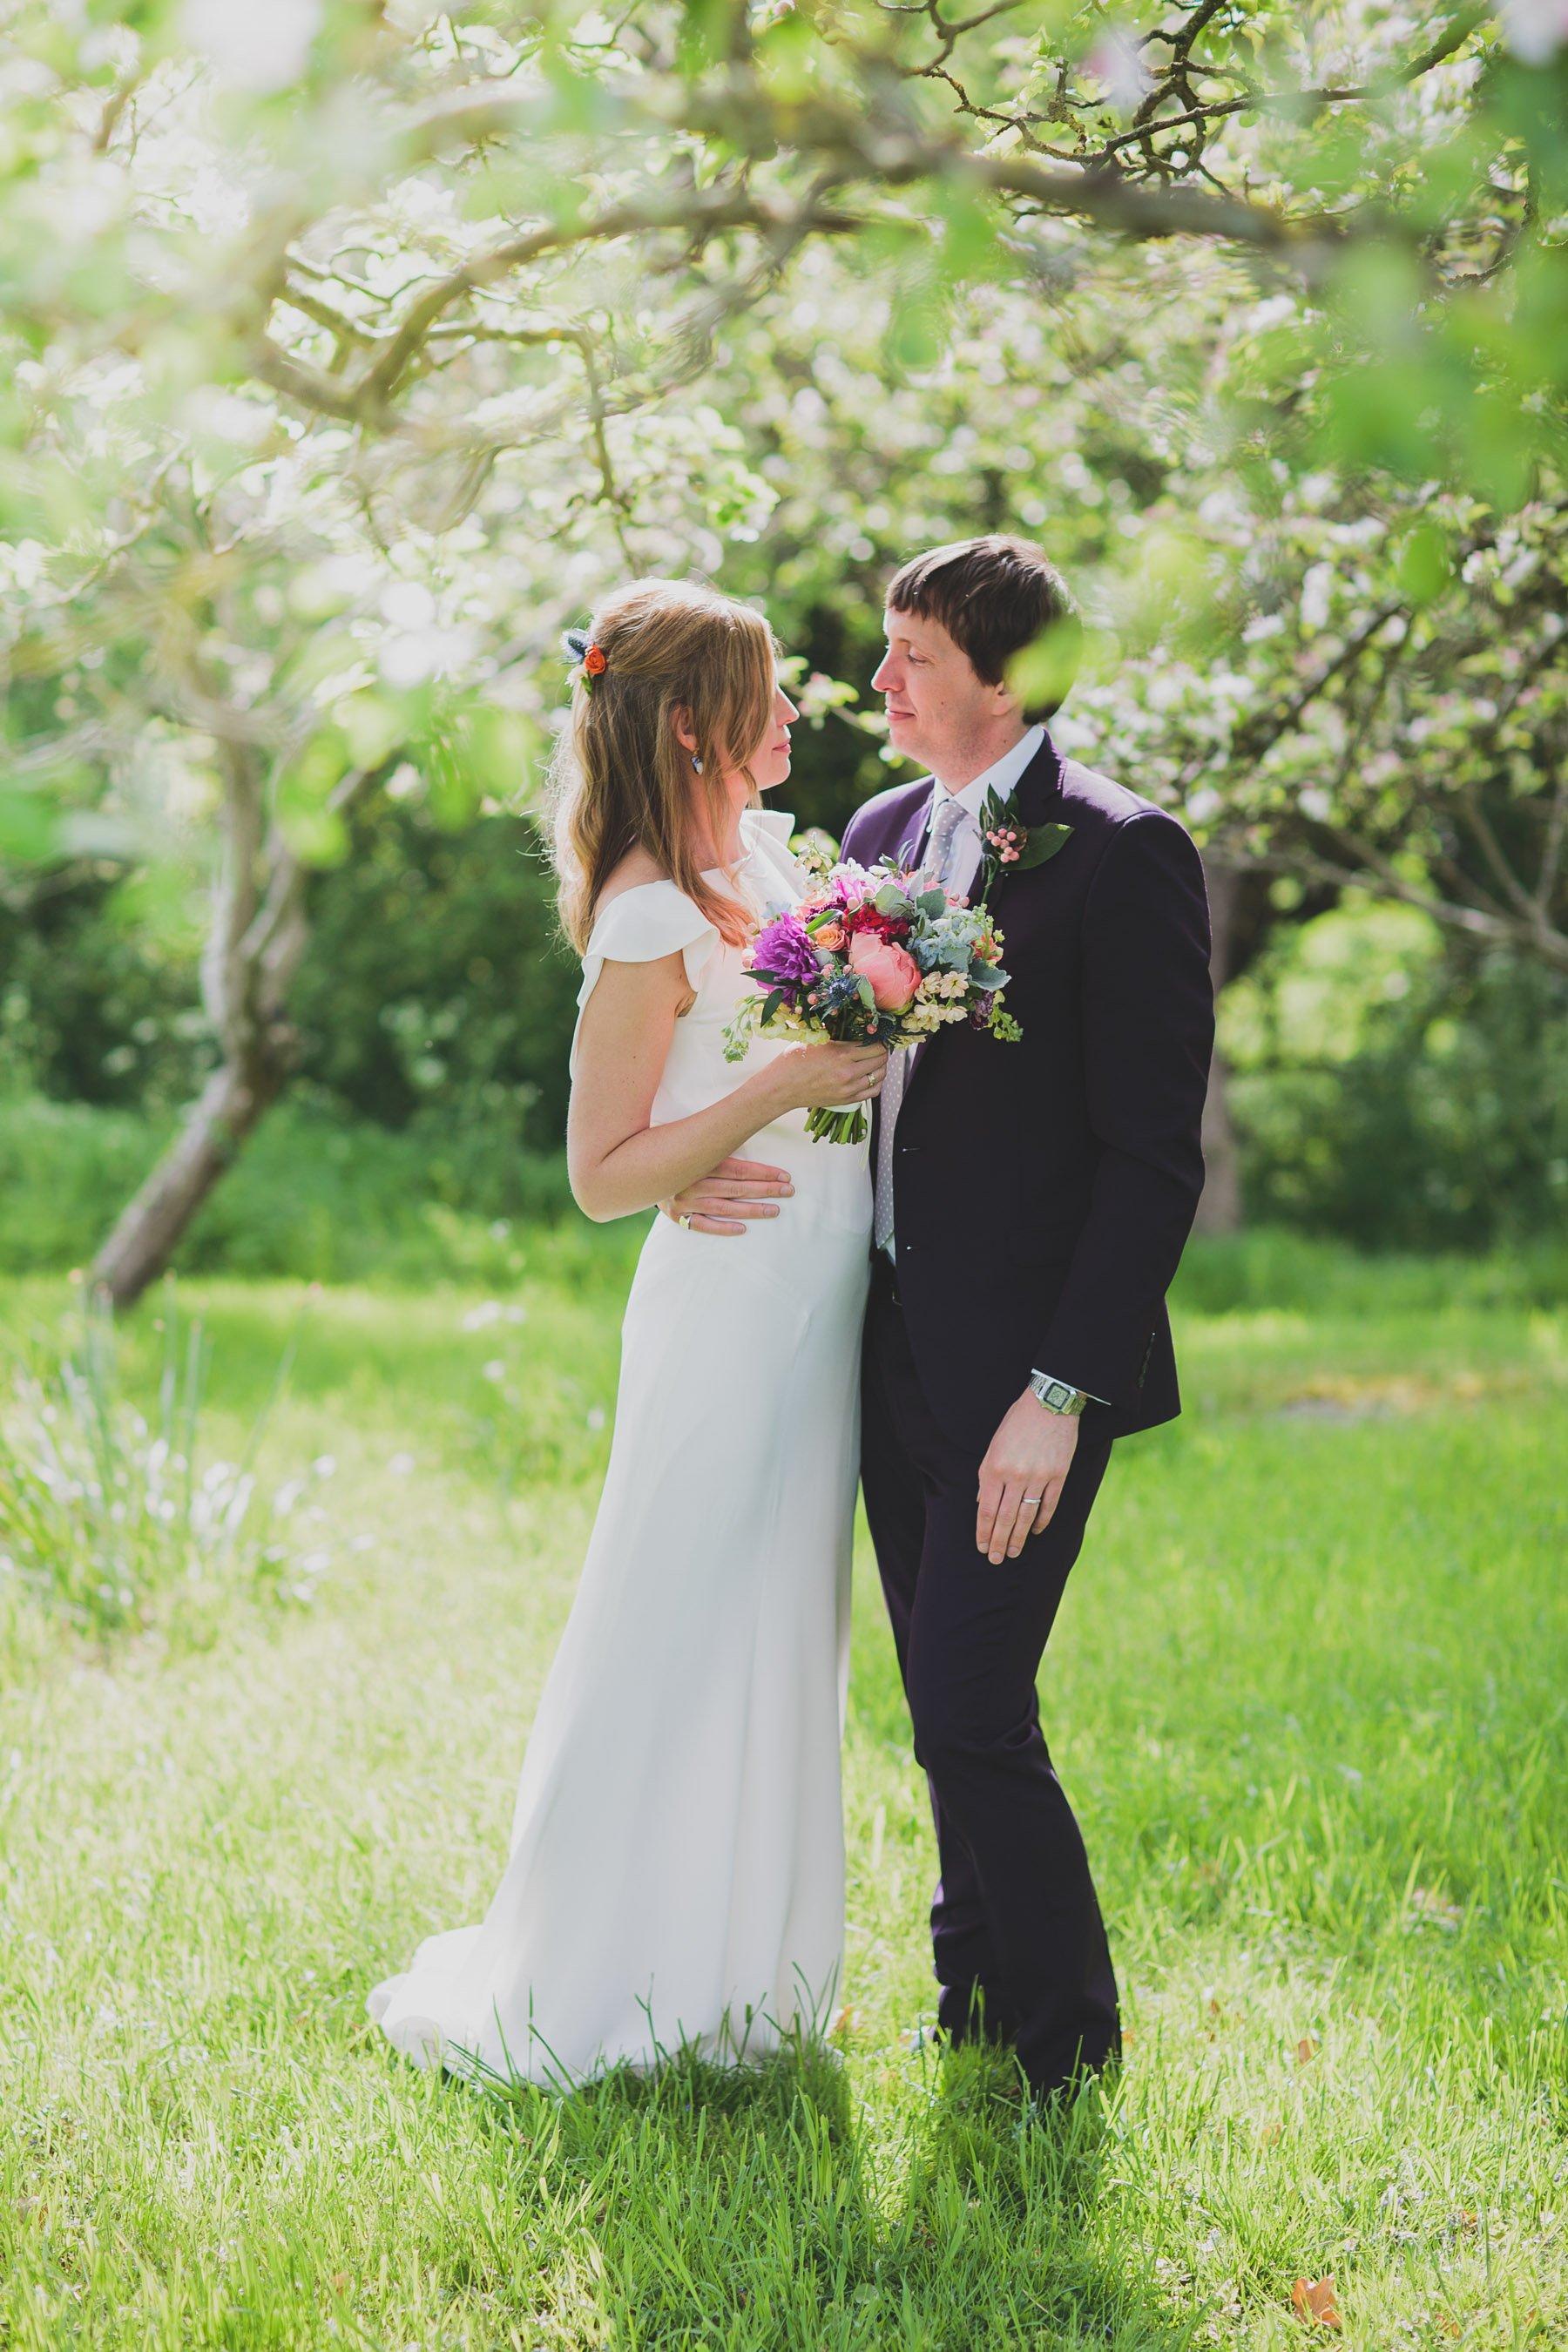 Buckinghamshire-Wedding-Lizzie-Duncan-100